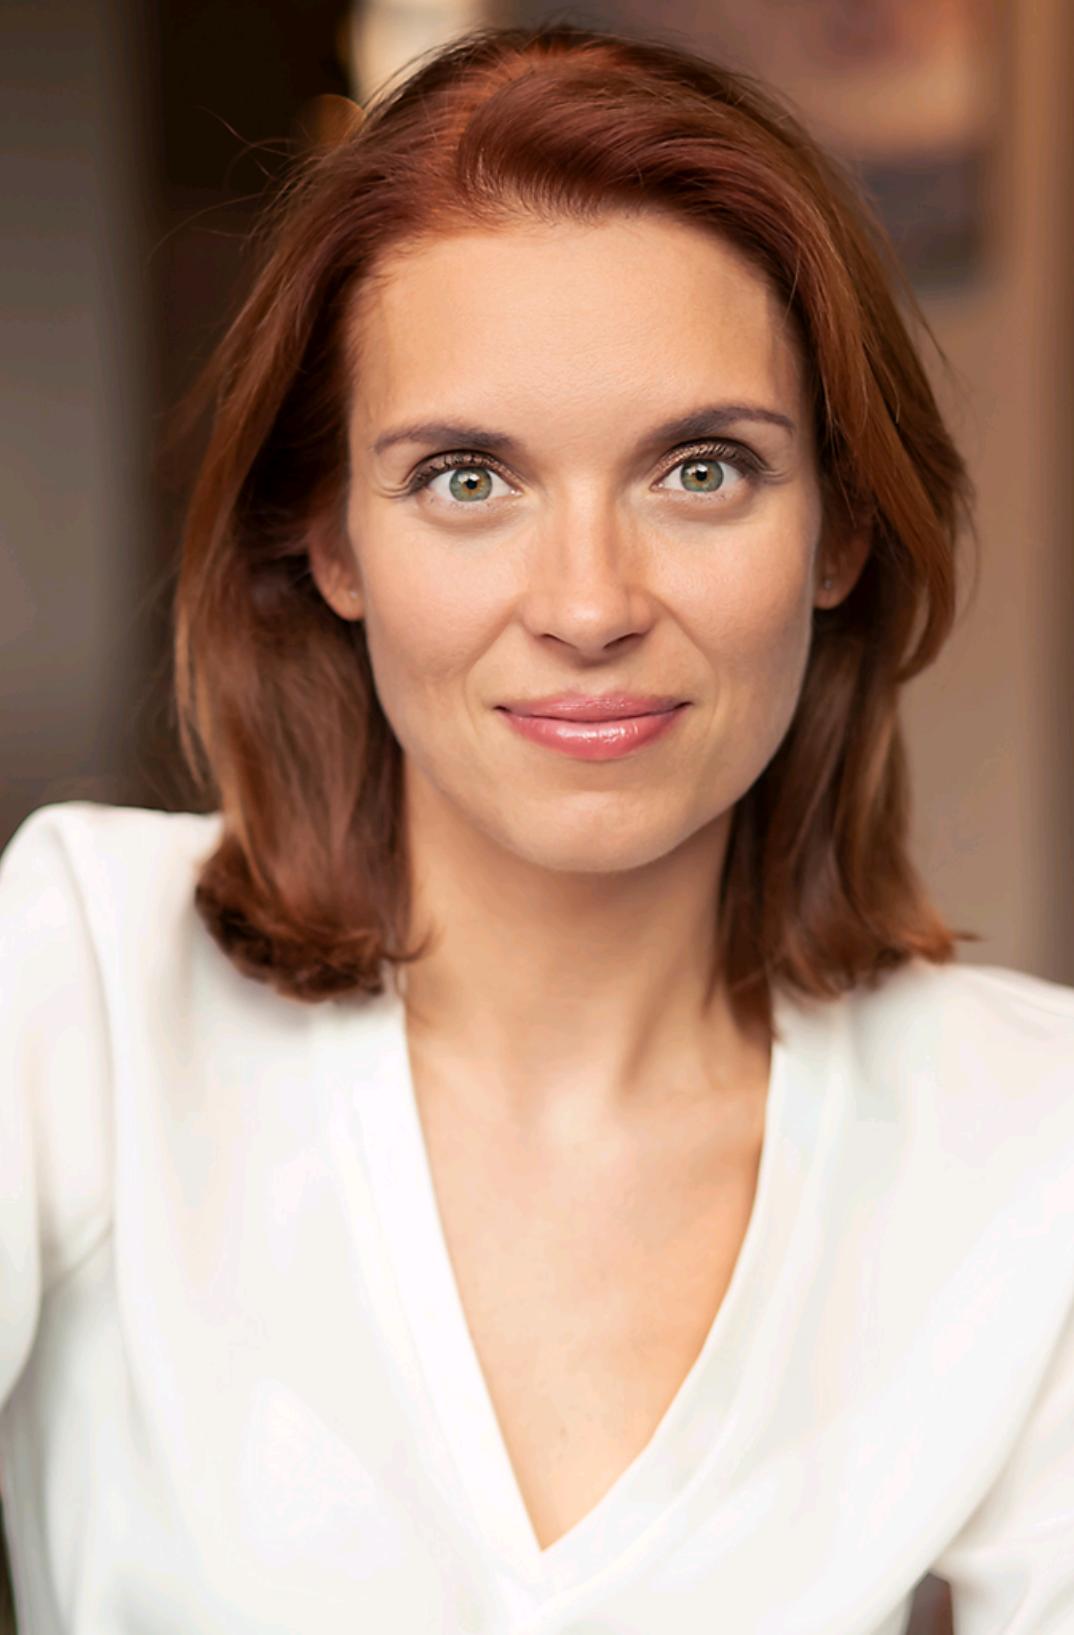 Jolanta Skrobowska